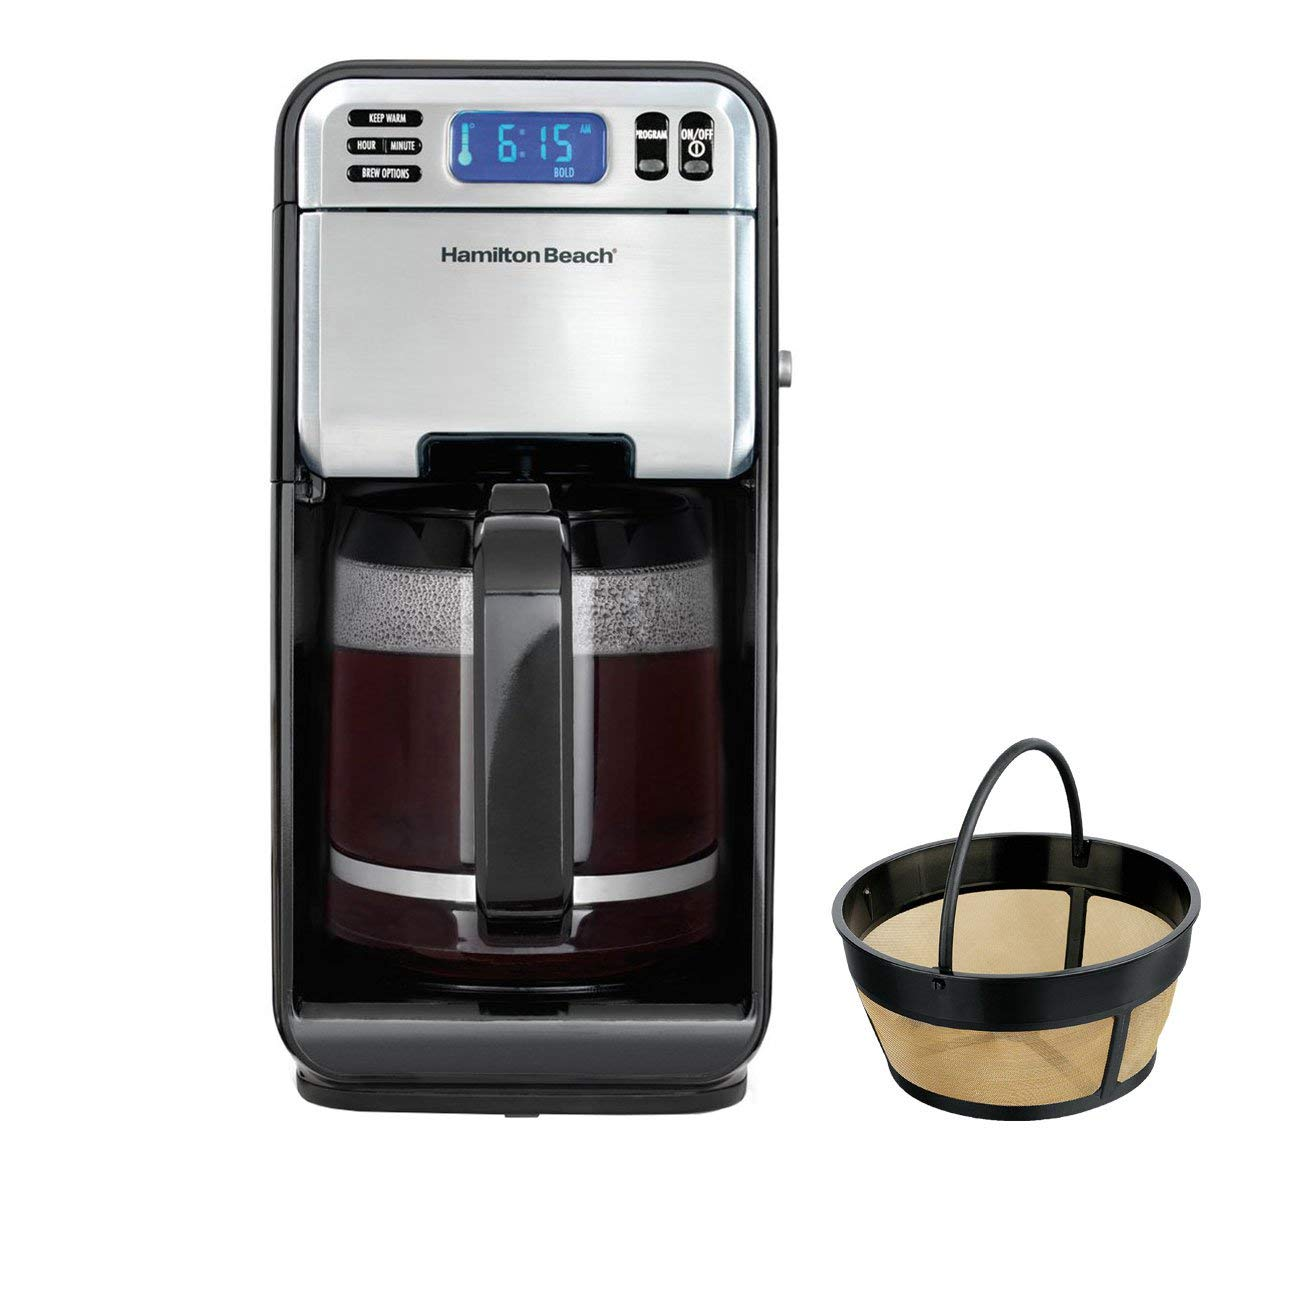 Hamilton Beach 12 Cup Digital Automatic LCD Coffeemaker Brewer & Coffee Filter